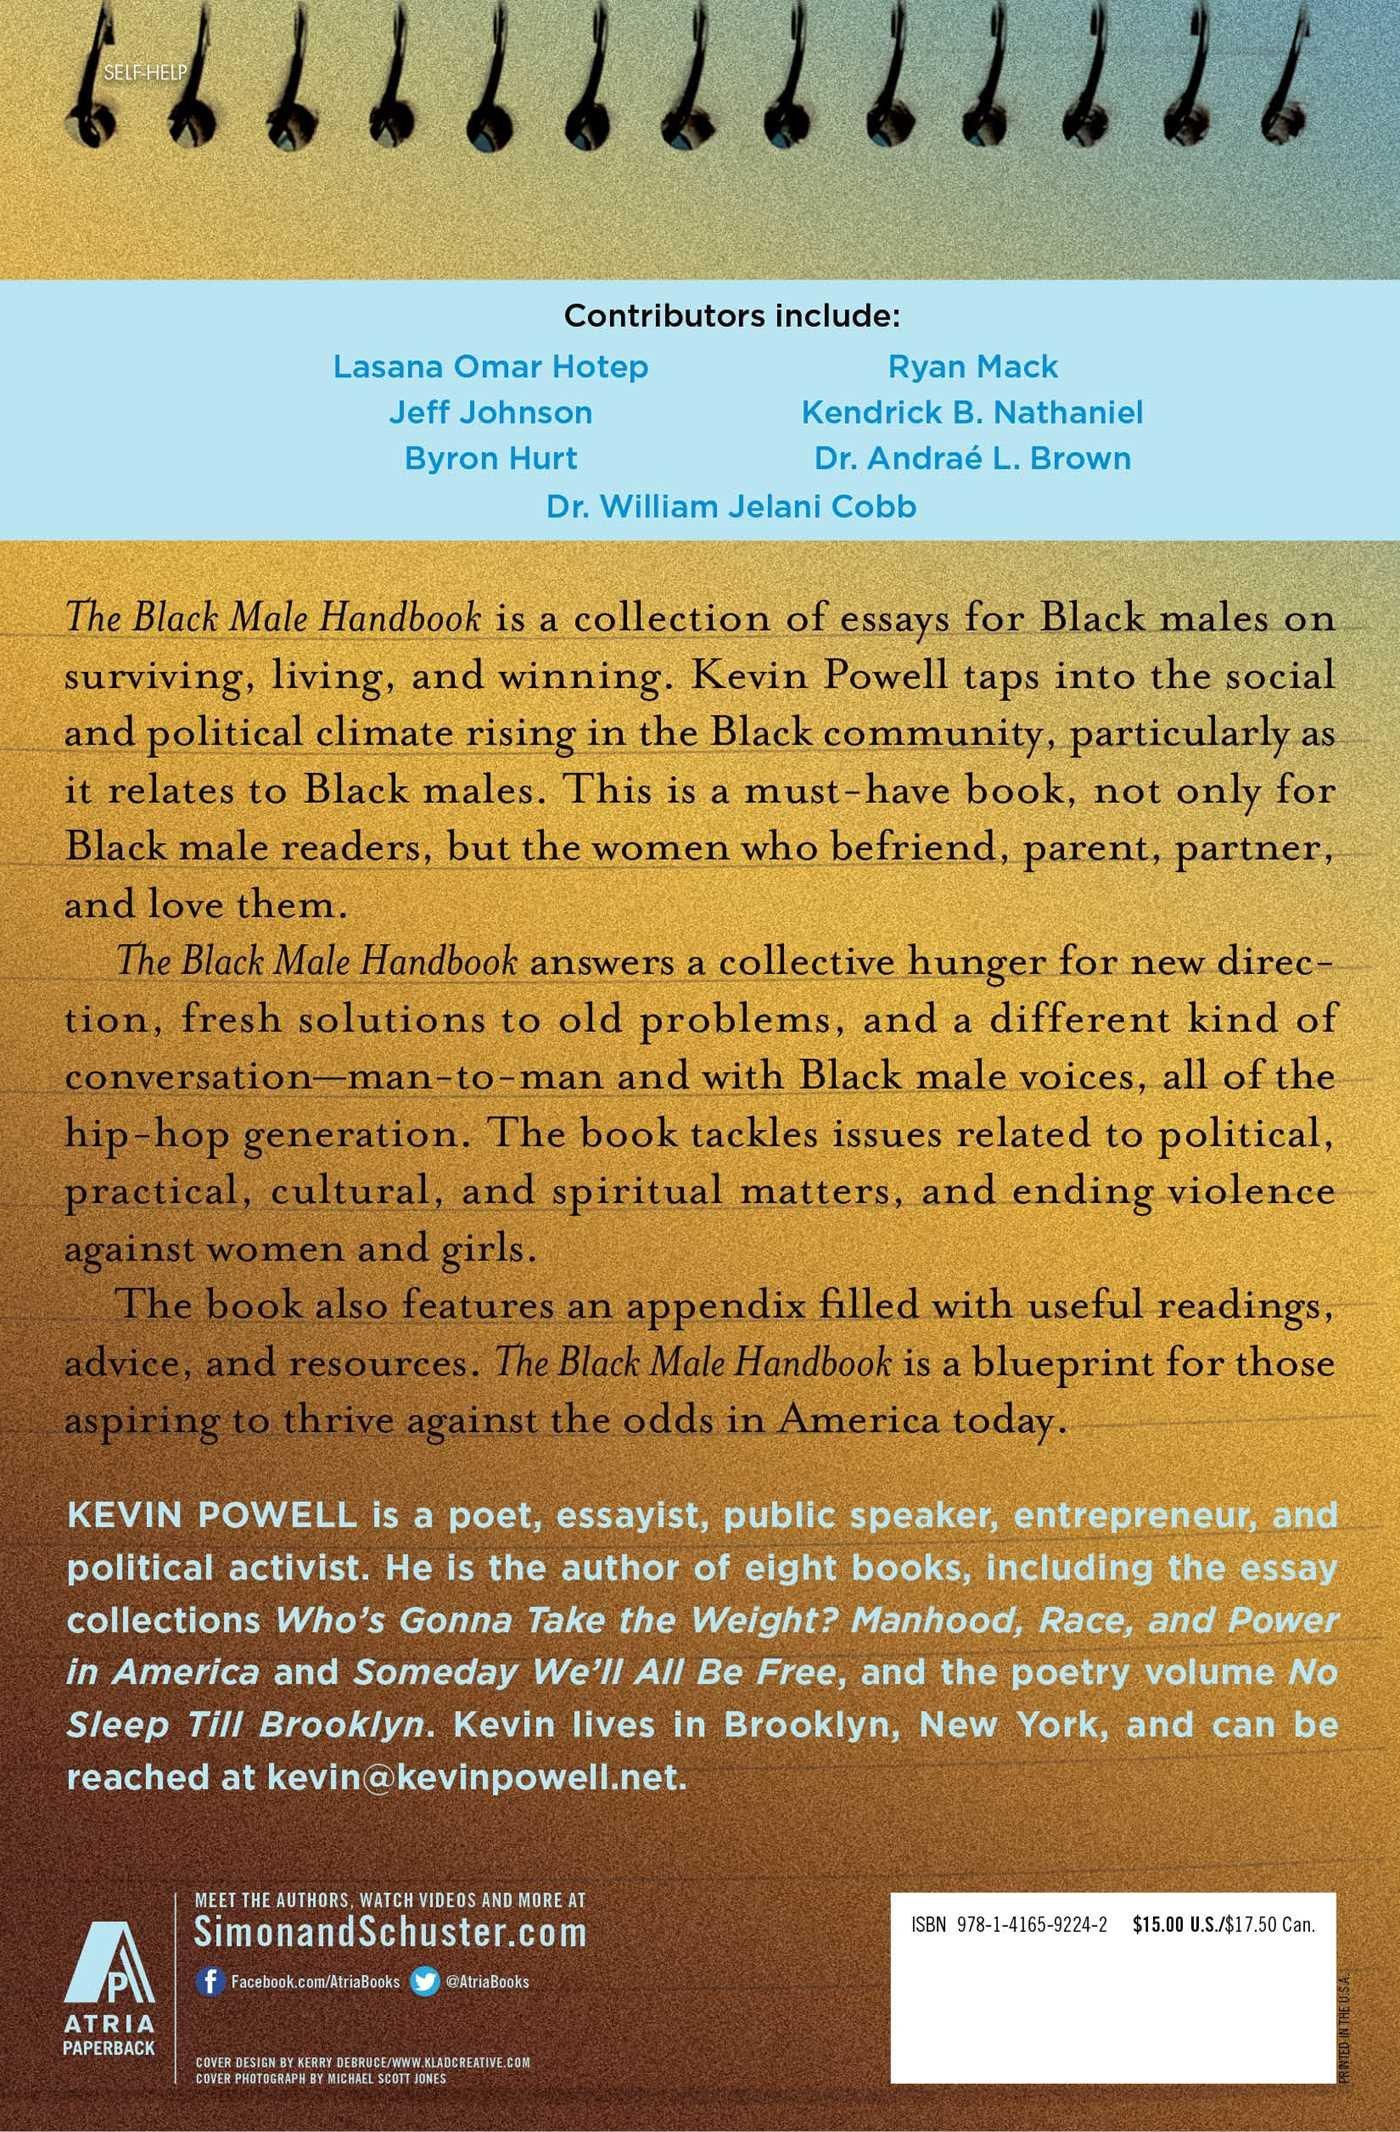 The black male handbook a blueprint for life kevin powell hill the black male handbook a blueprint for life kevin powell hill harper 9781416592242 amazon books malvernweather Gallery